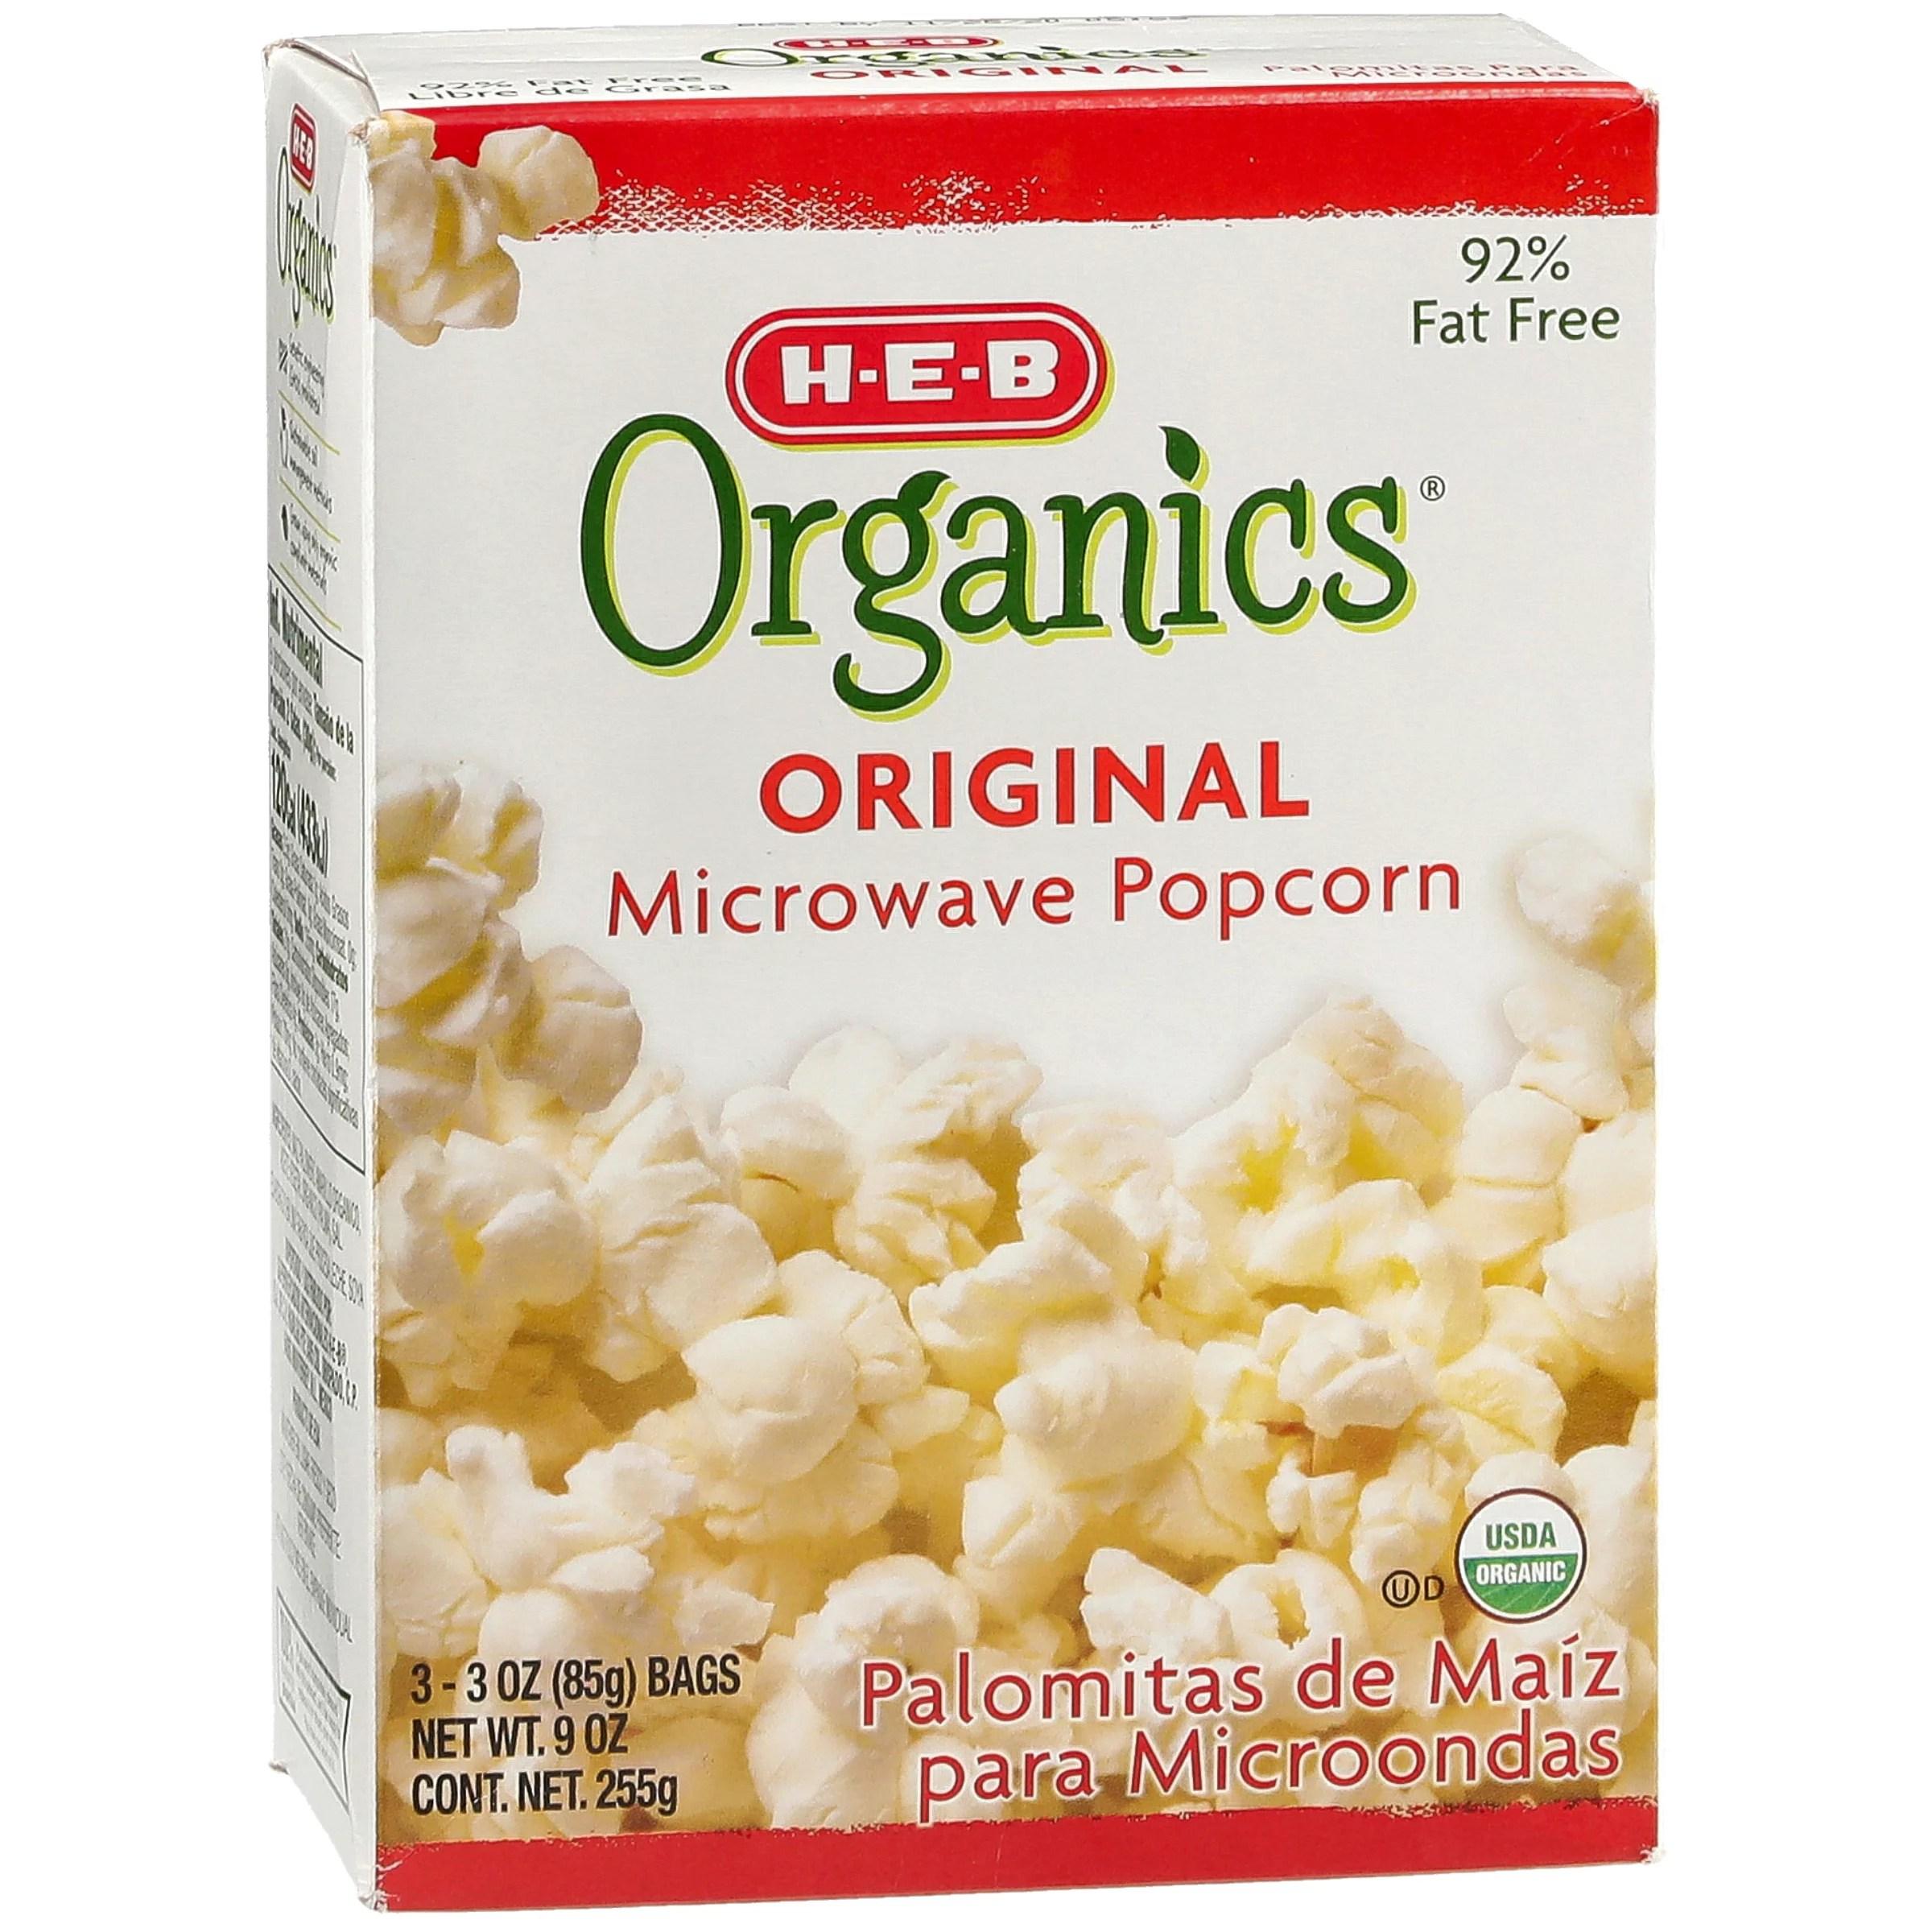 h e b organics original microwave popcorn